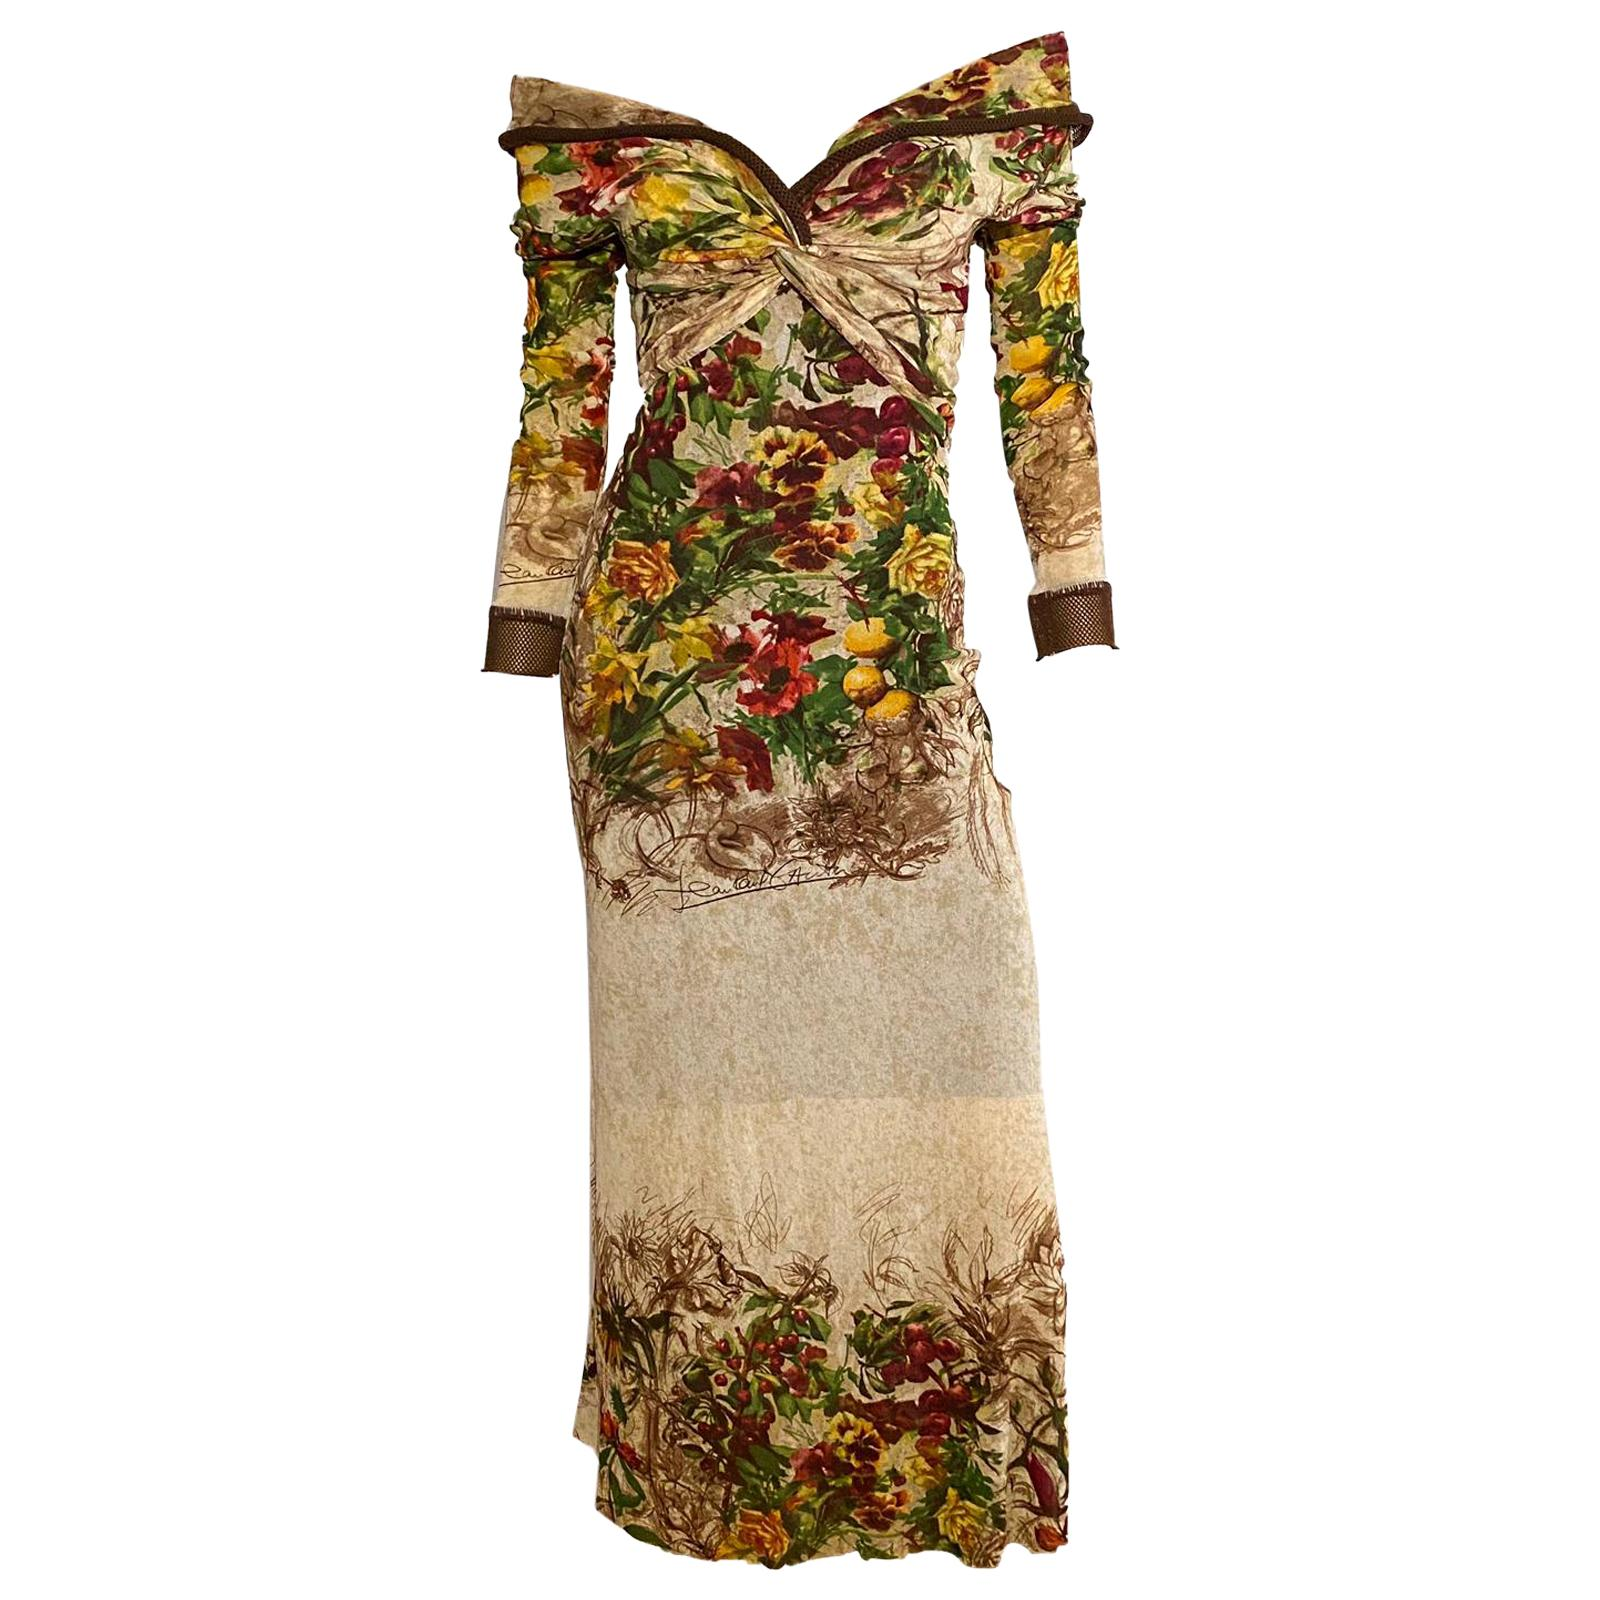 Jean Paul Gaultier S/S 1999 Runway Floral print dress